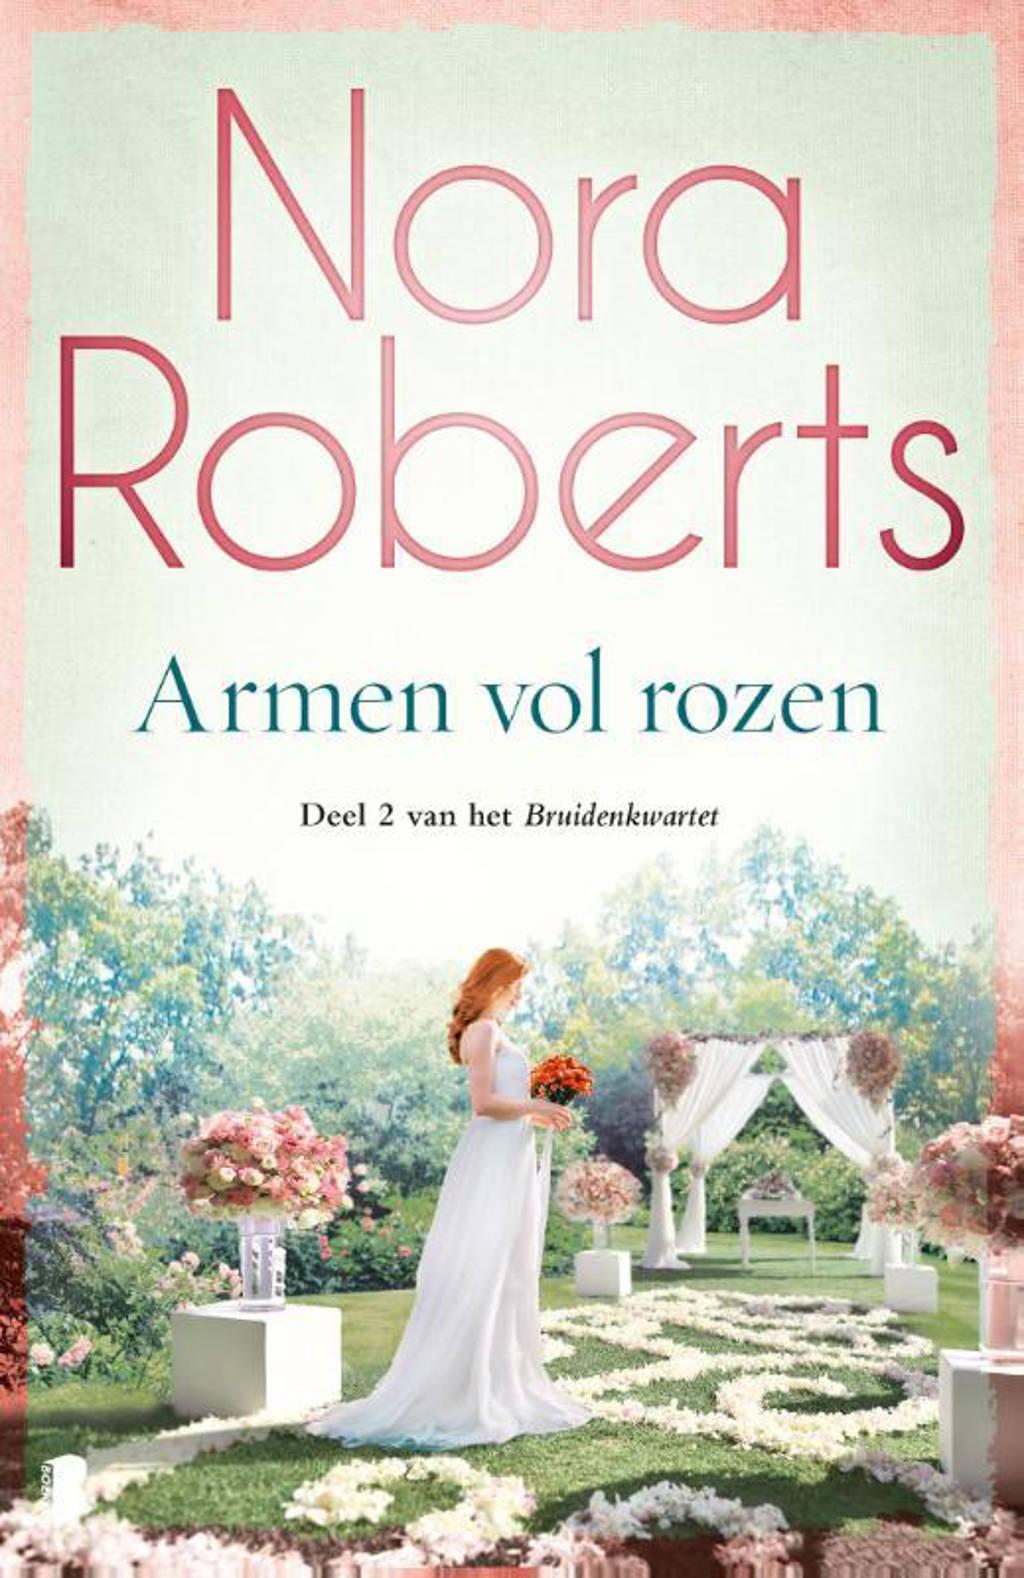 Bruidenkwartet: Armen vol rozen - Nora Roberts